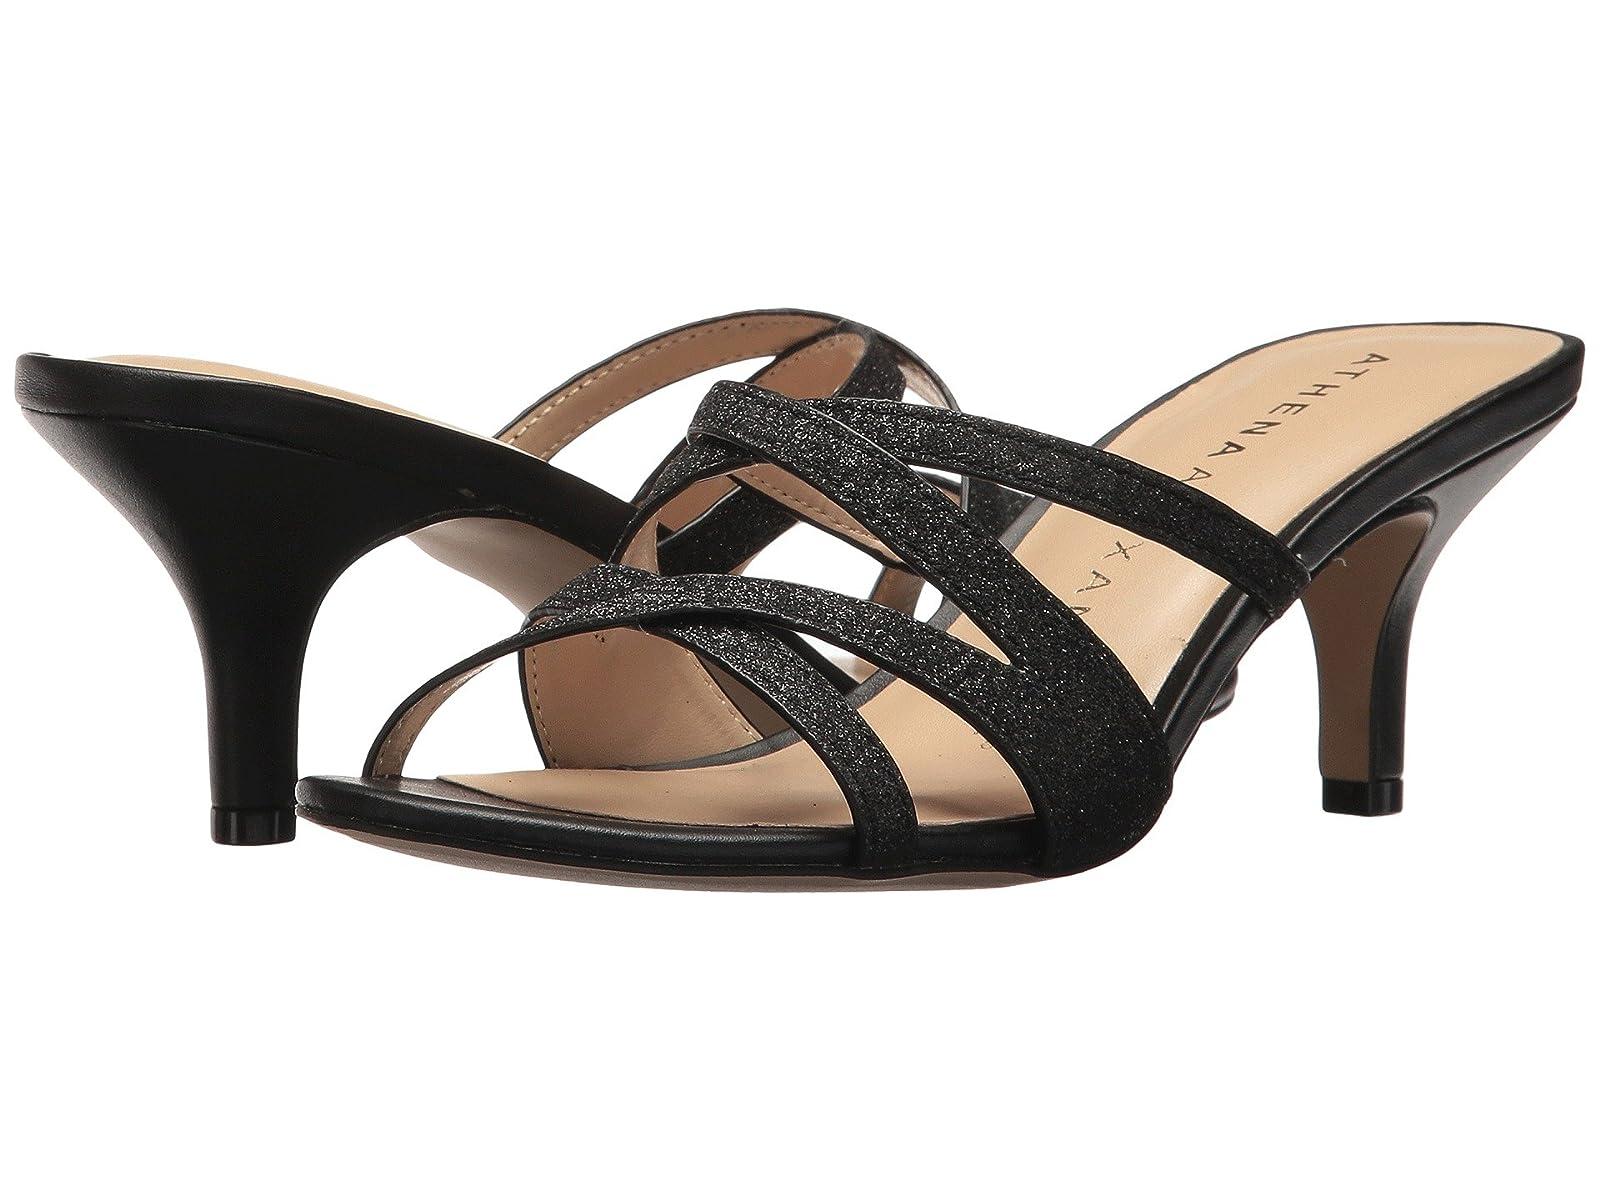 Athena Alexander StarlightAtmospheric grades have affordable shoes